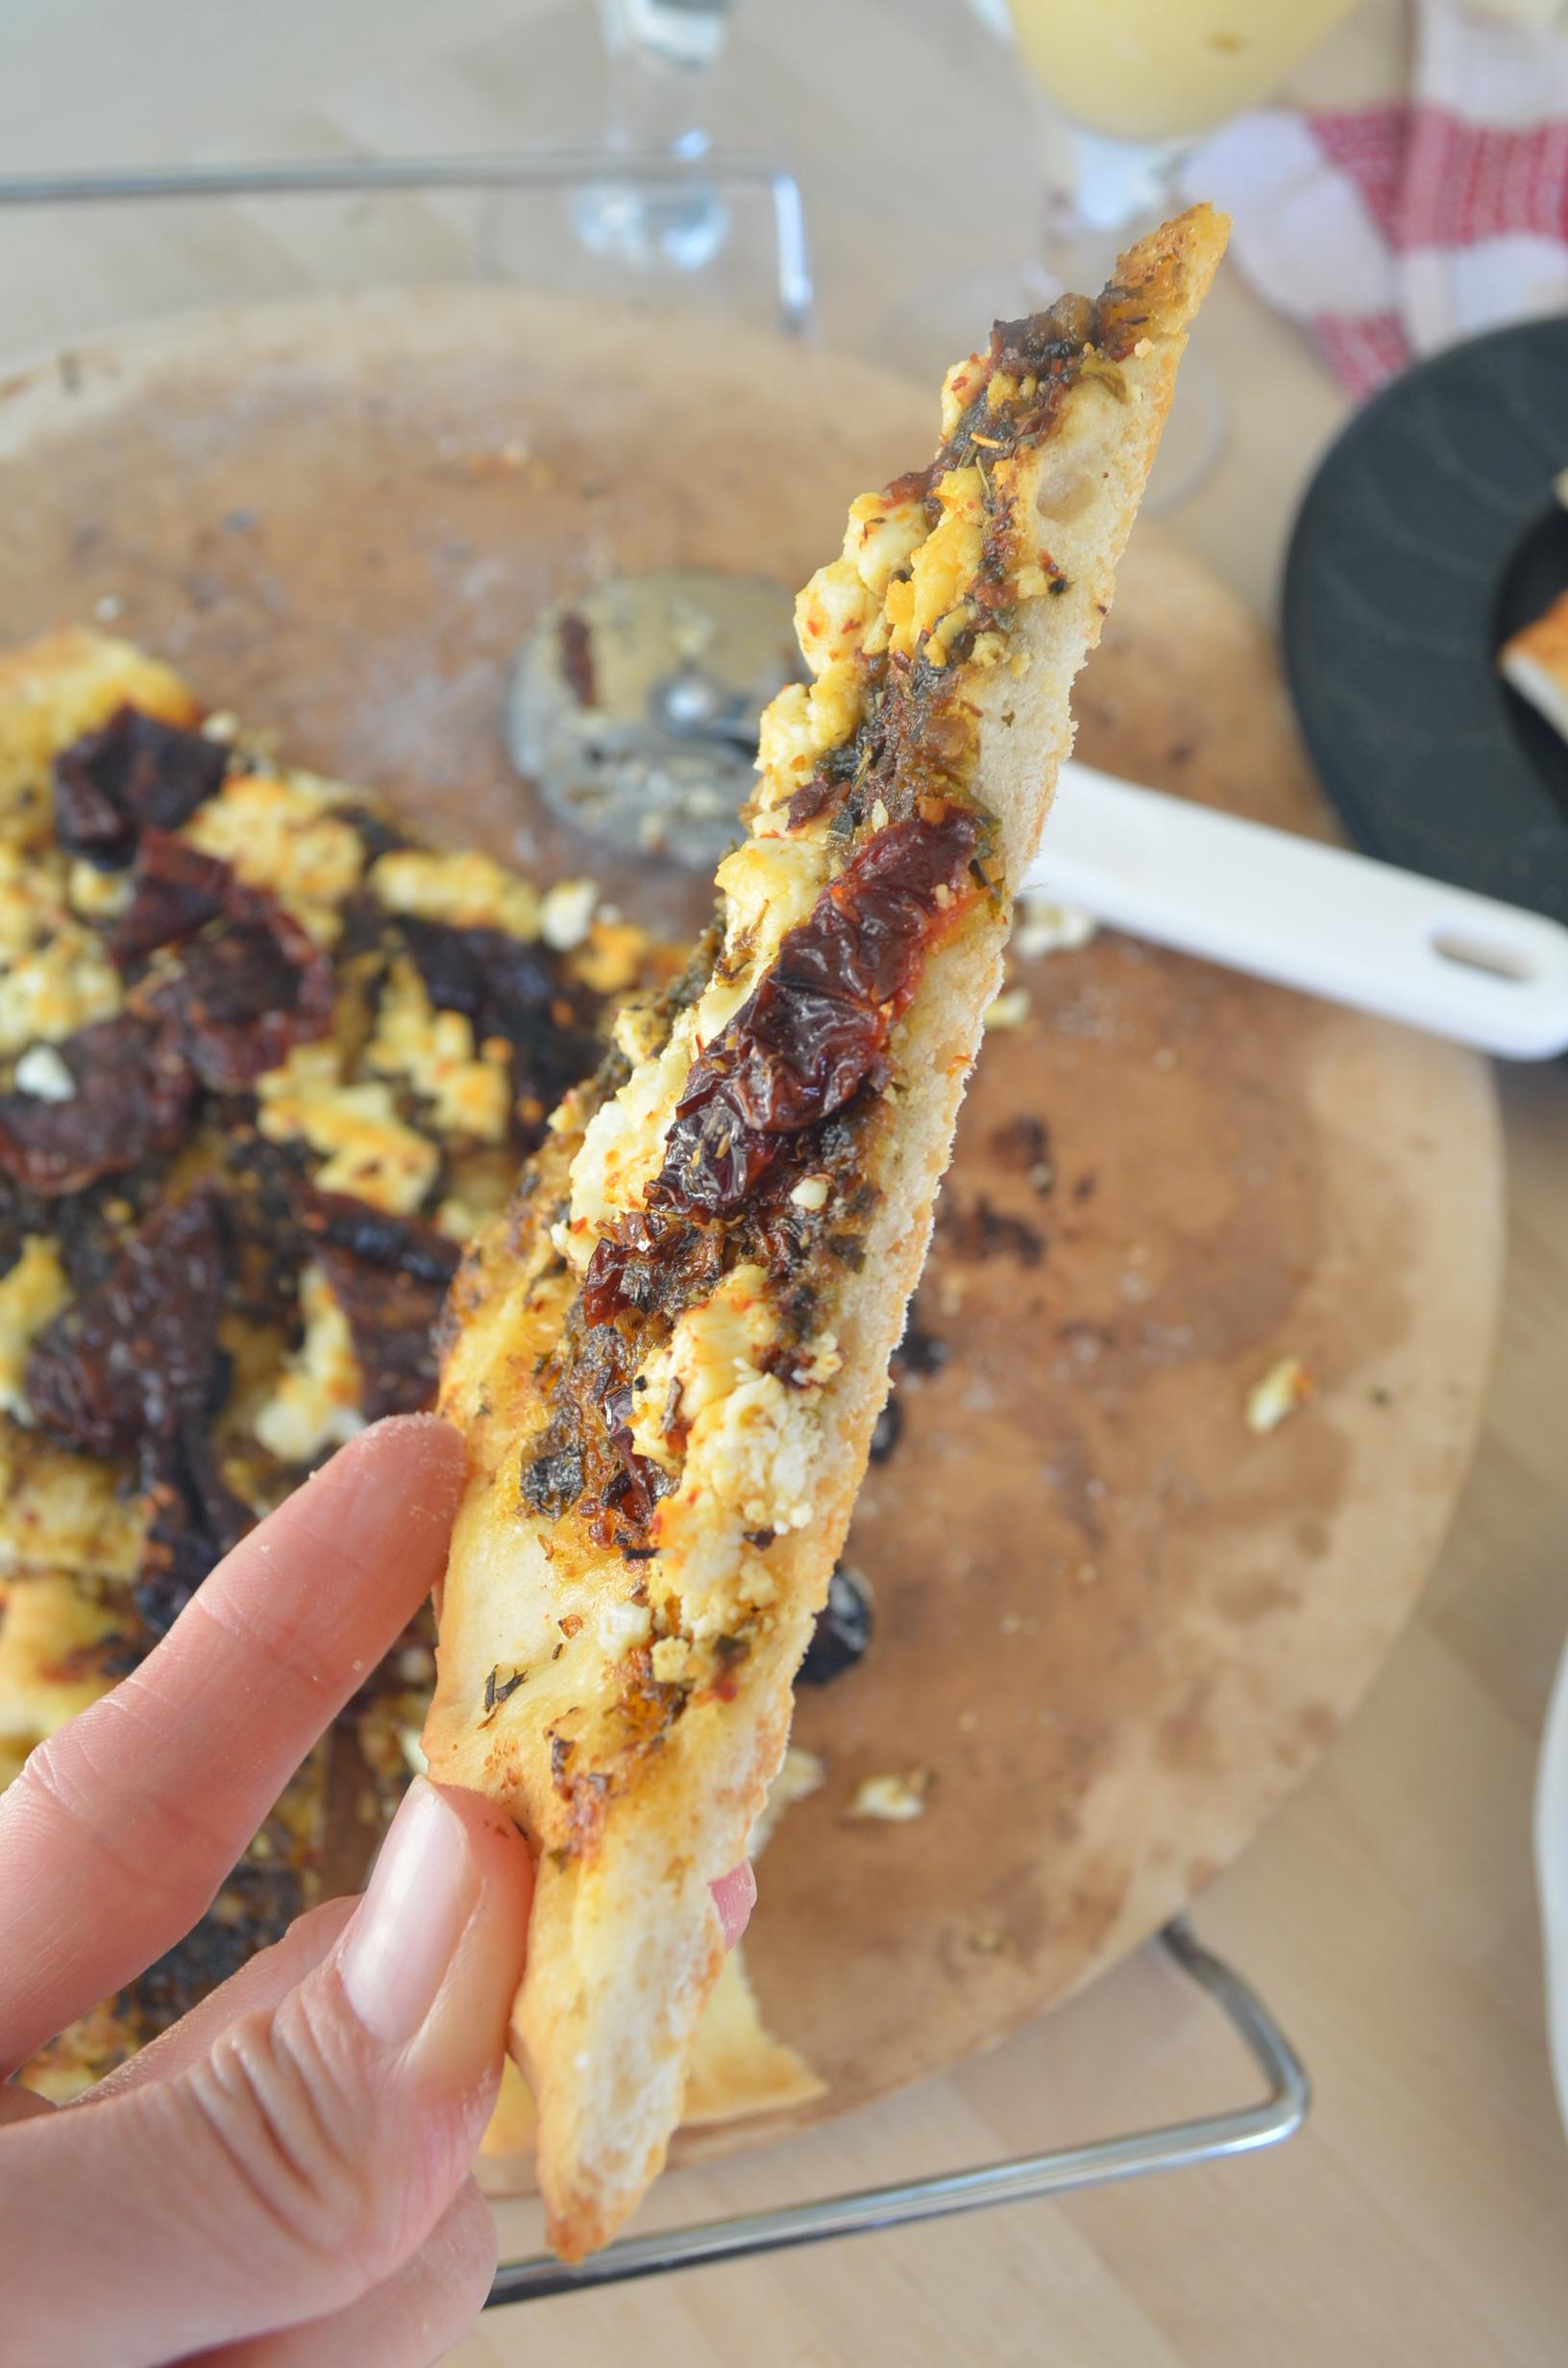 Homemade Pesto Pizza with Sundried Tomato